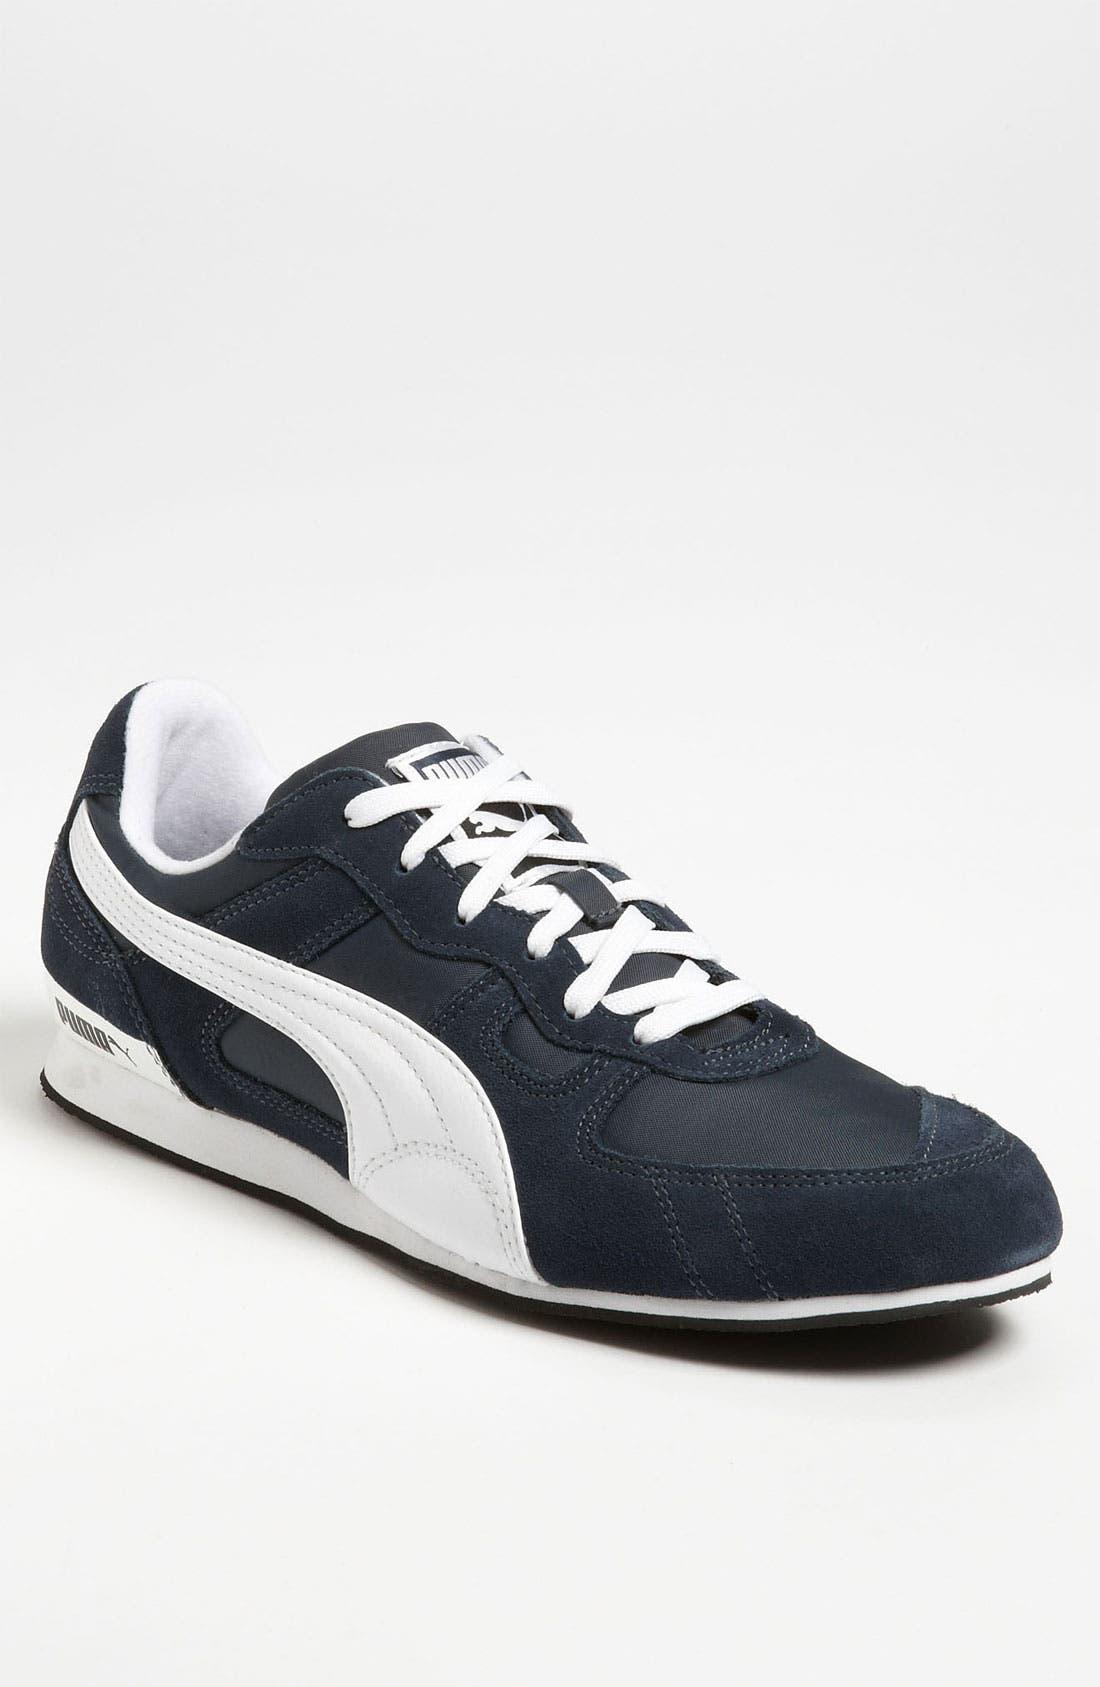 Alternate Image 1 Selected - PUMA 'Bayndyt' Sneaker (Men) (Online Exclusive)